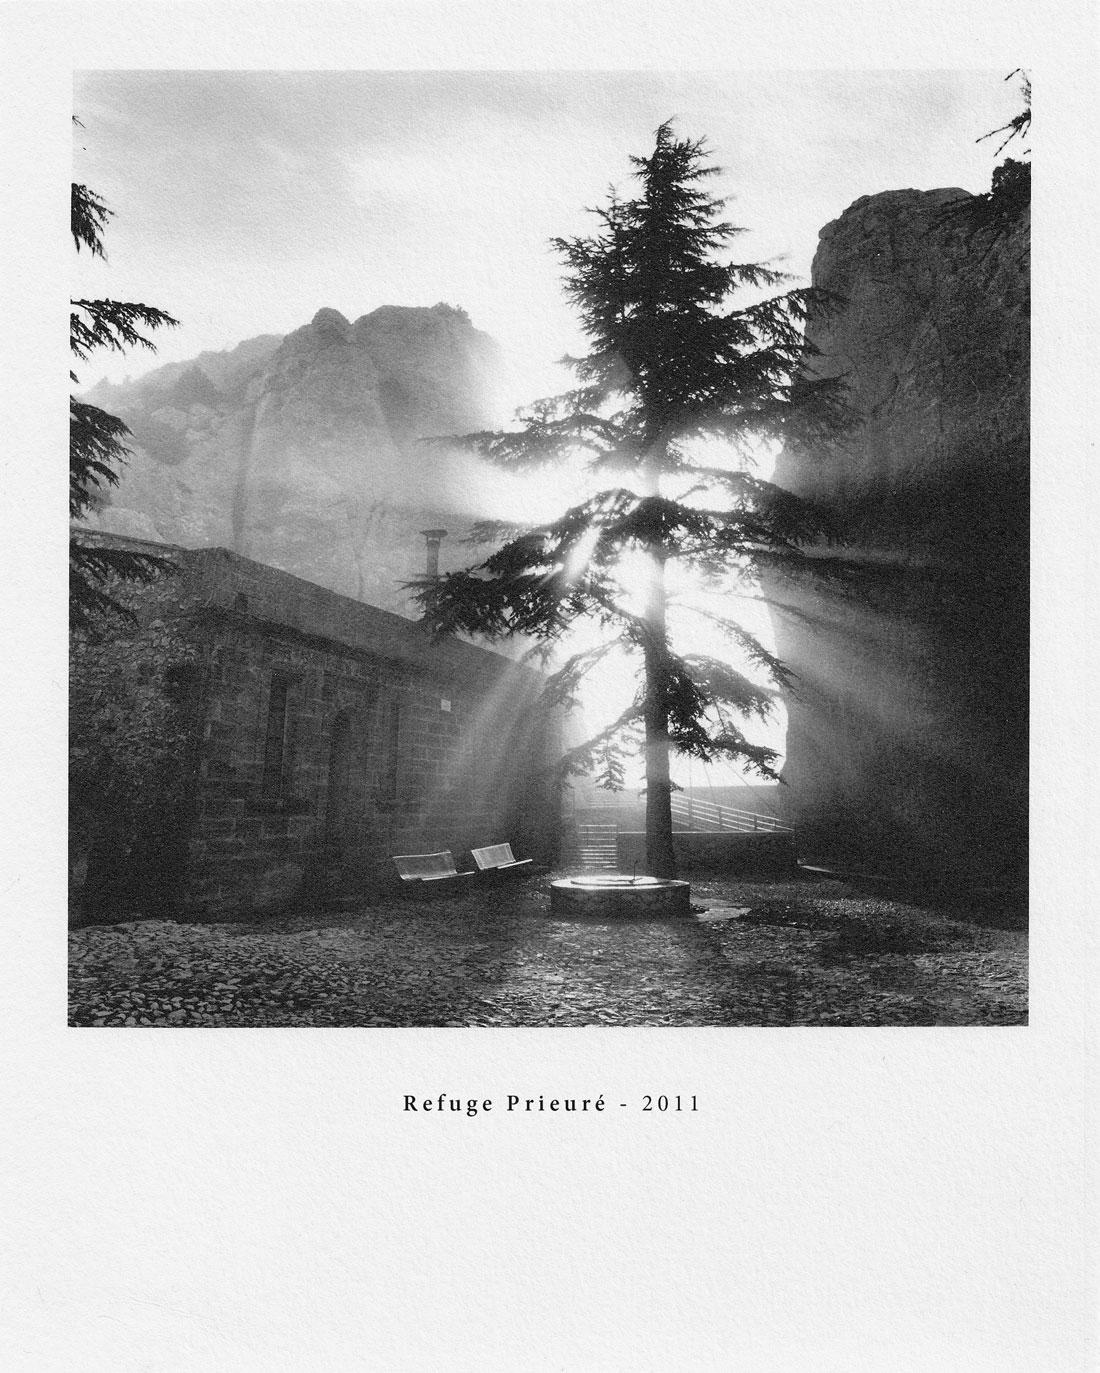 18-Refuge-Prieuré-1